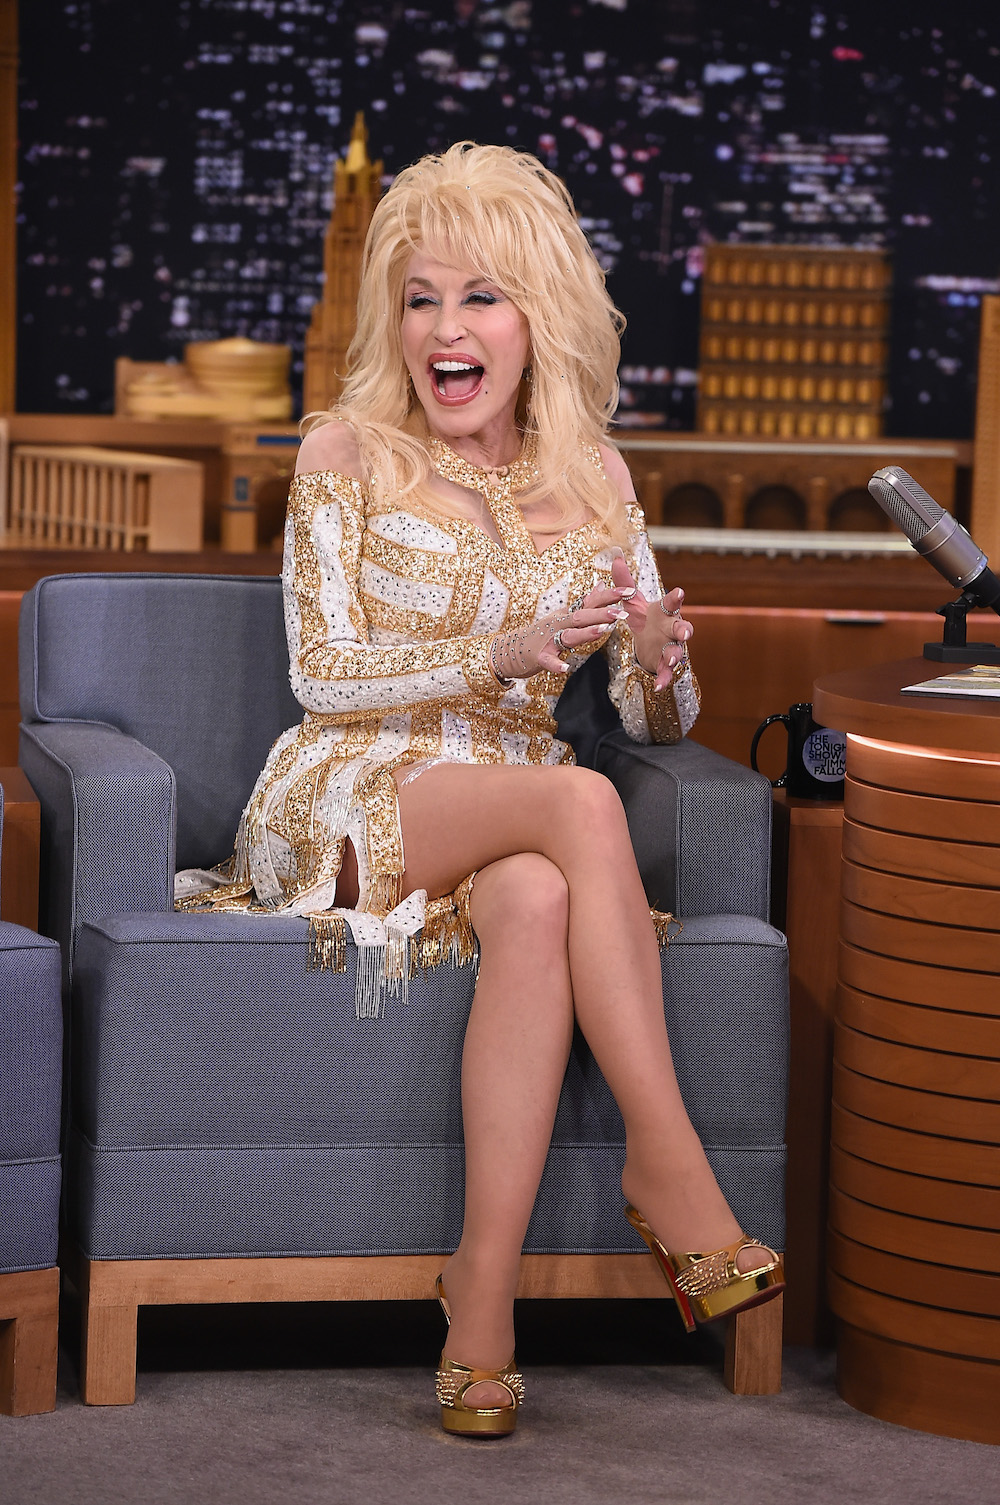 dolly-parton-heels.jpg